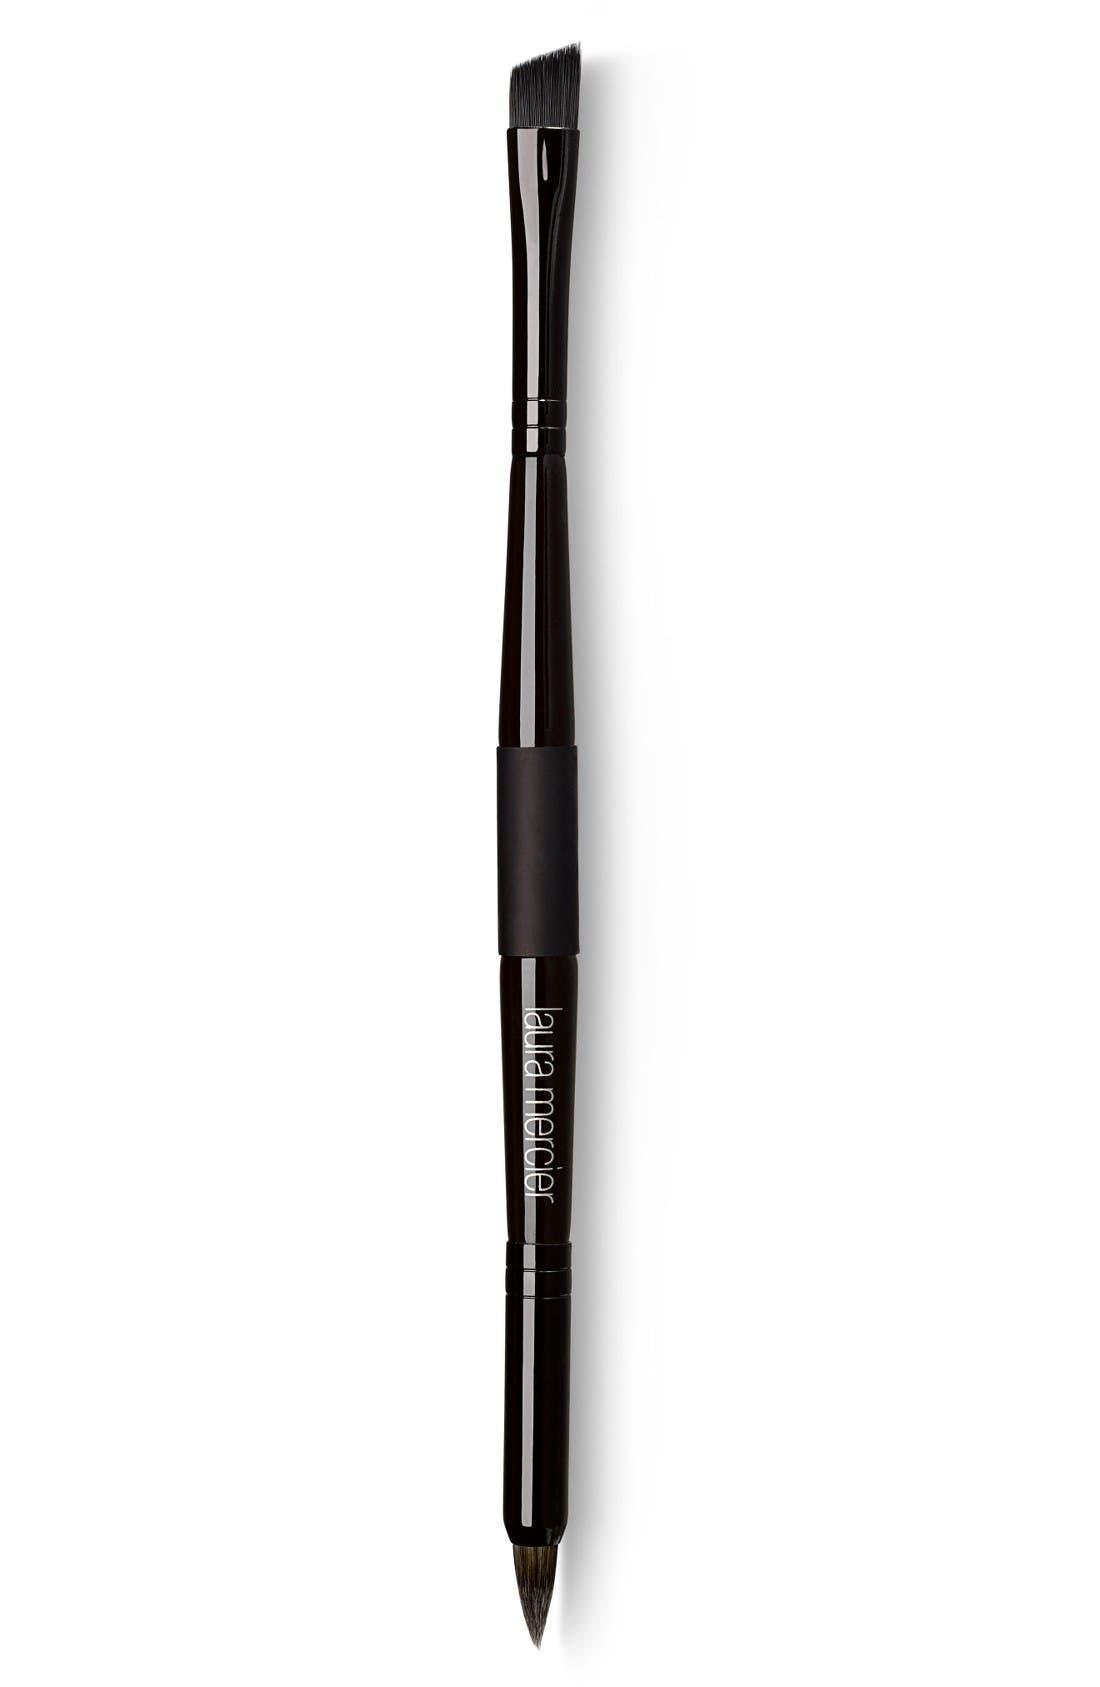 Laura Mercier Sketch & Intensify Double-Ended Brow Brush